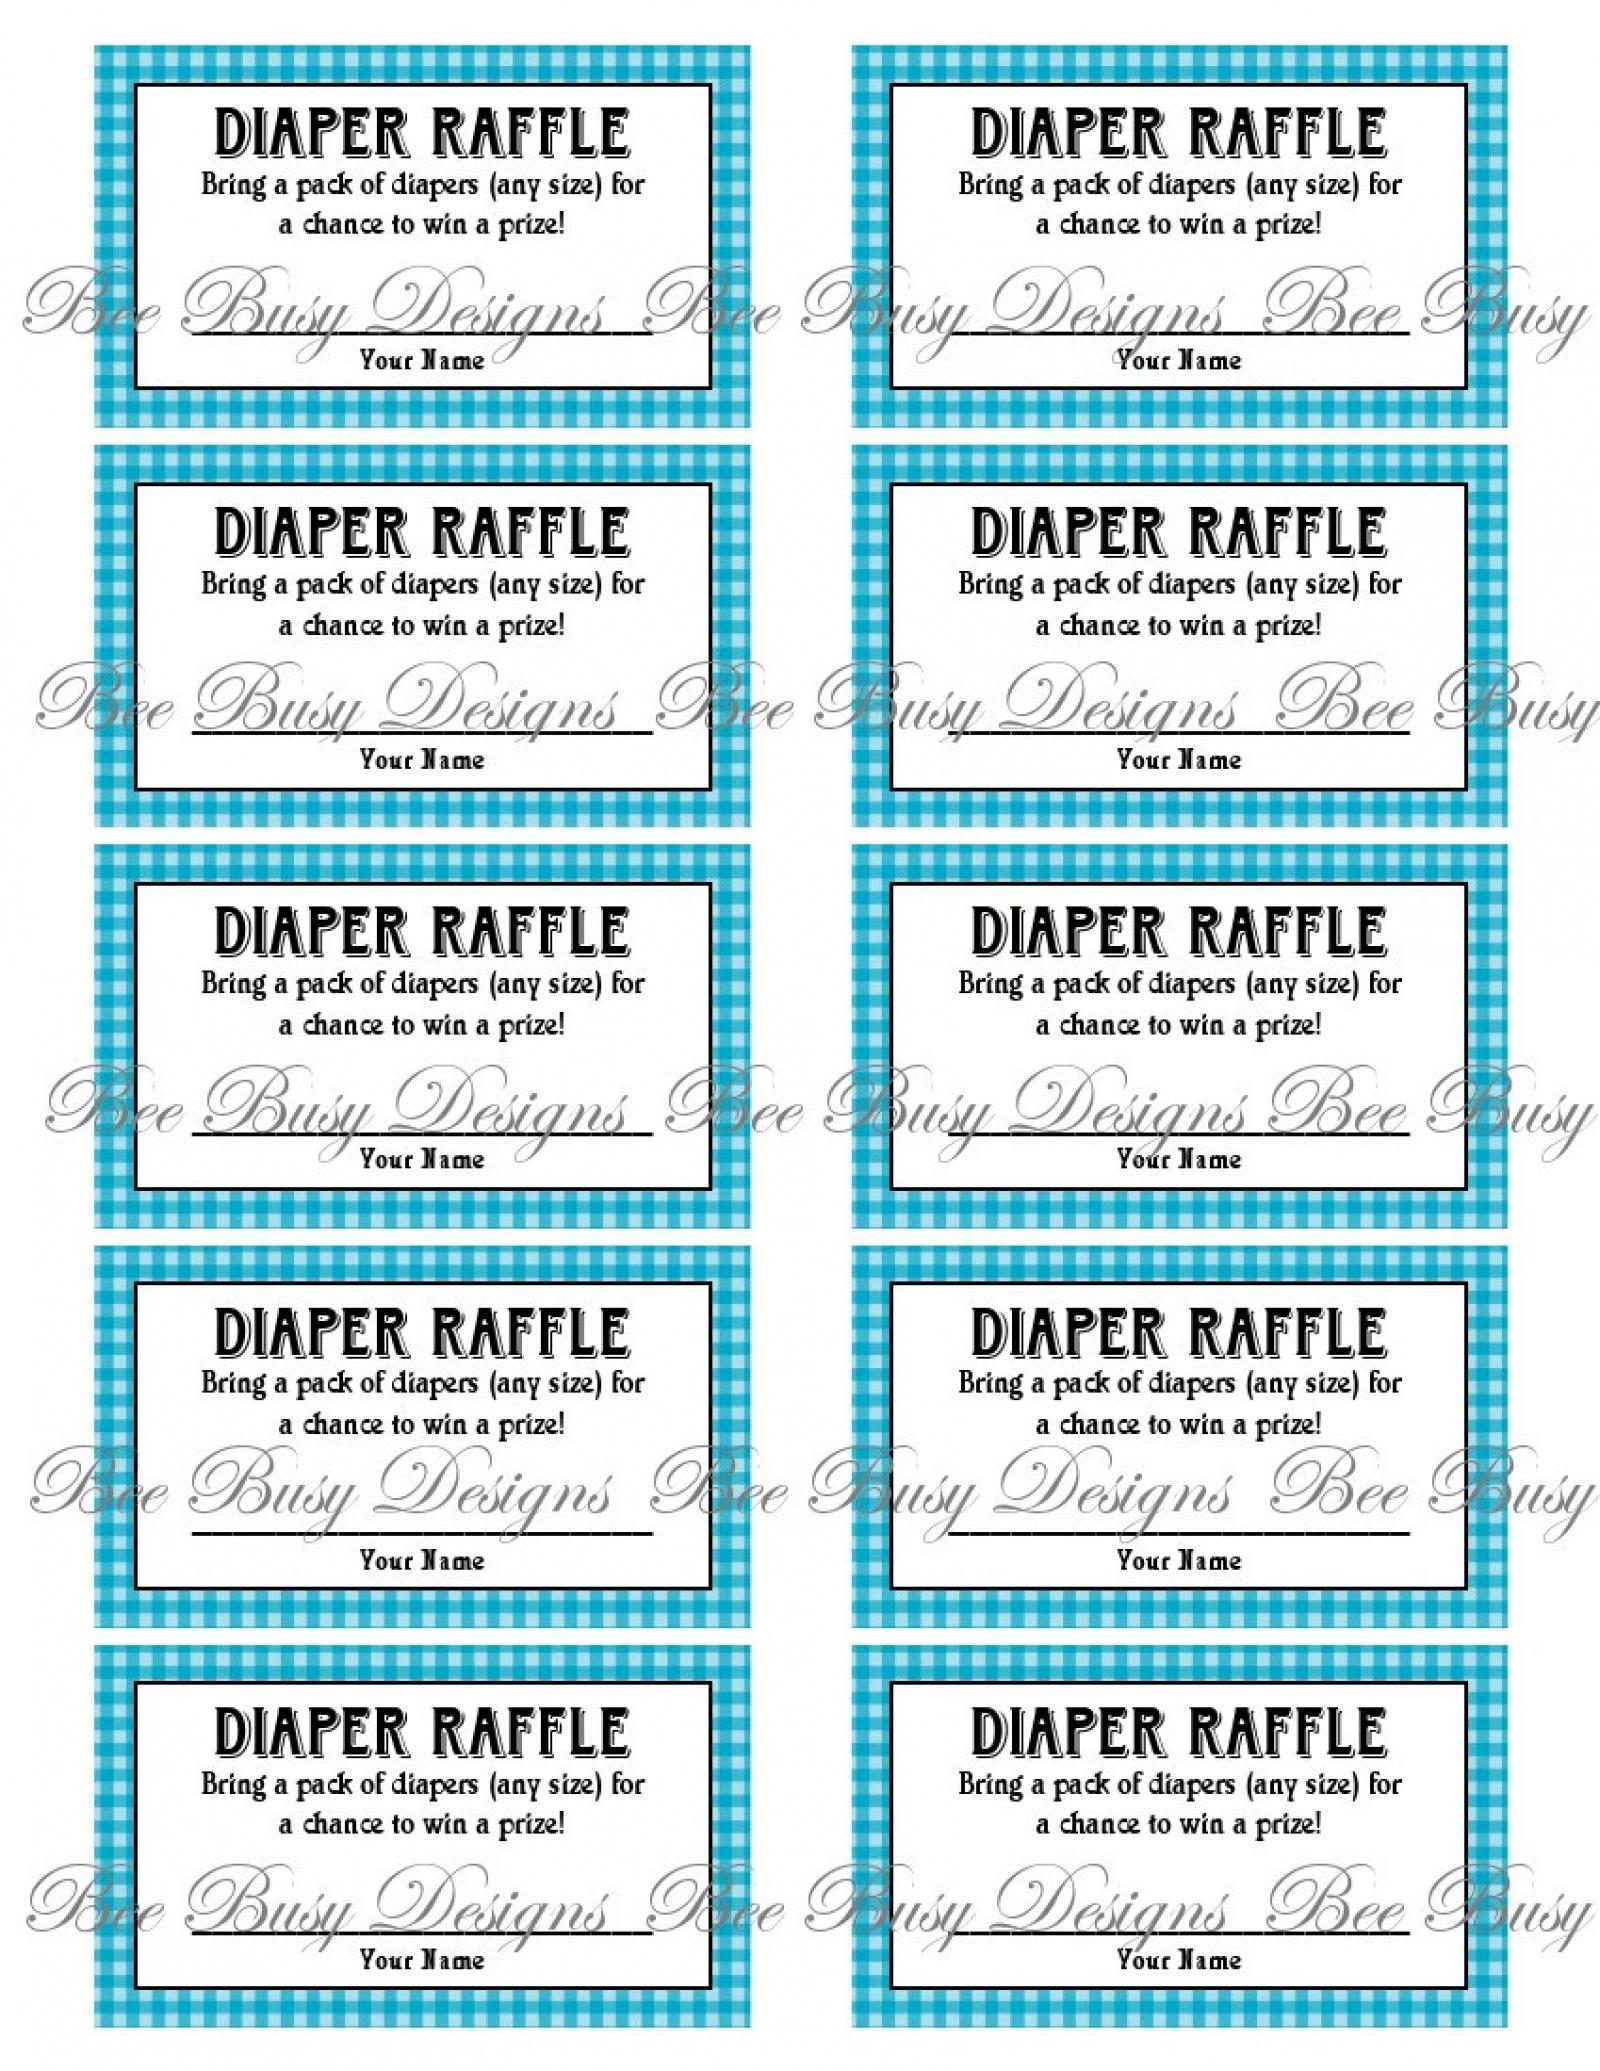 Diaper Raffle Tickets Printable - Tutlin.psstech.co - Diaper Raffle Template Free Printable